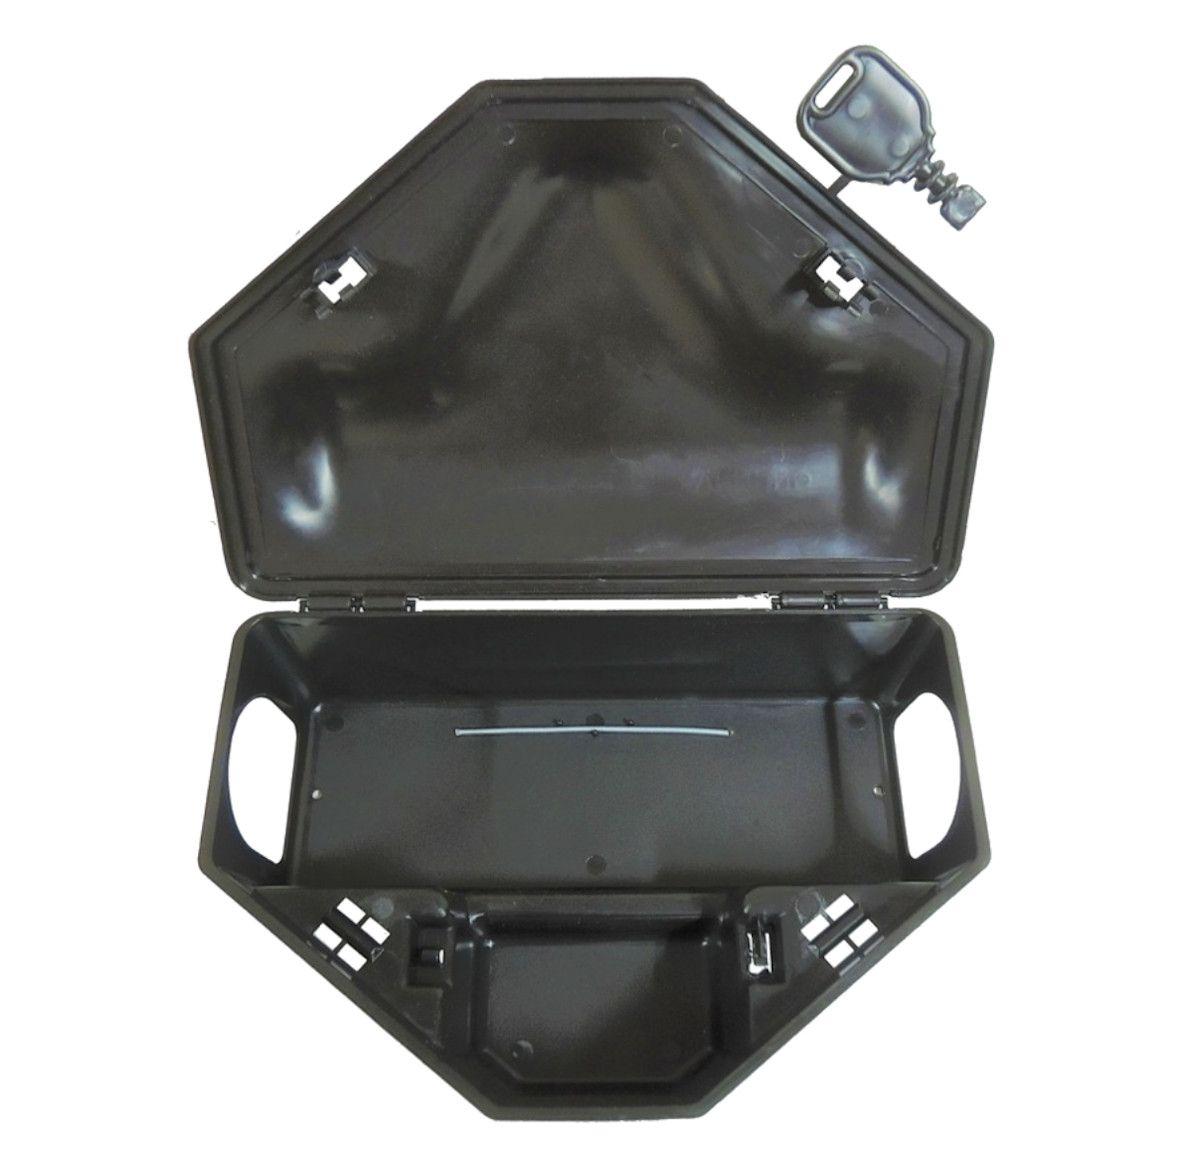 Kit 50 Porta Isca Com Chave Para Ratos